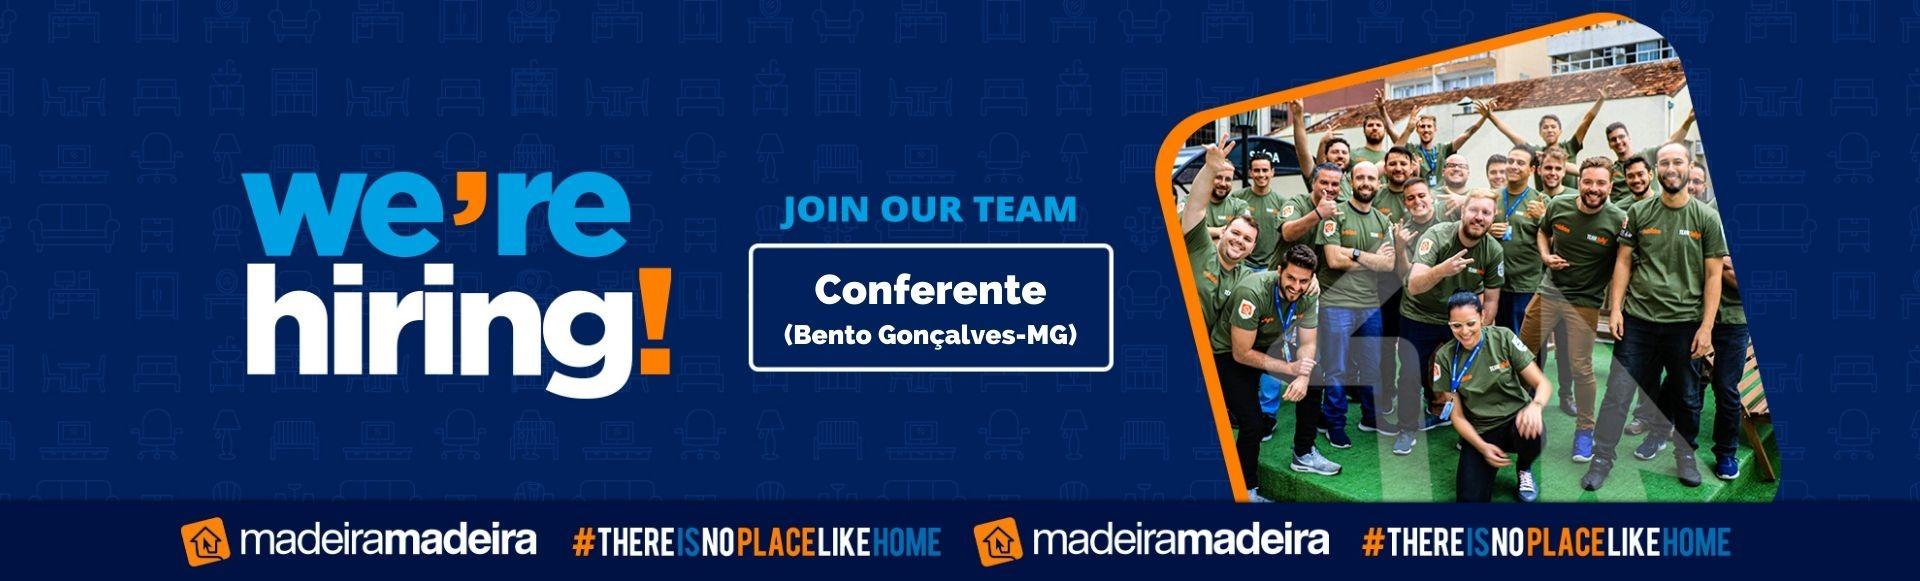 Banco de Talentos - Conferente (Bento Gonçalves-MG)